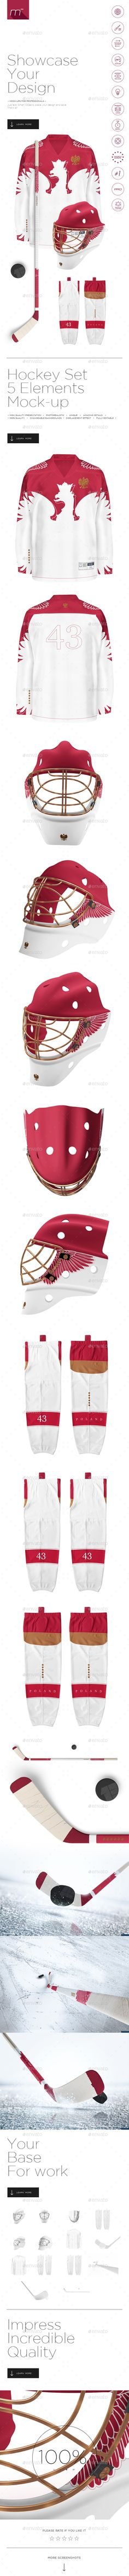 Hockey Set Mock-up #design Download: http://graphicriver.net/item/hockey-set-mockup/14275949?ref=ksioks